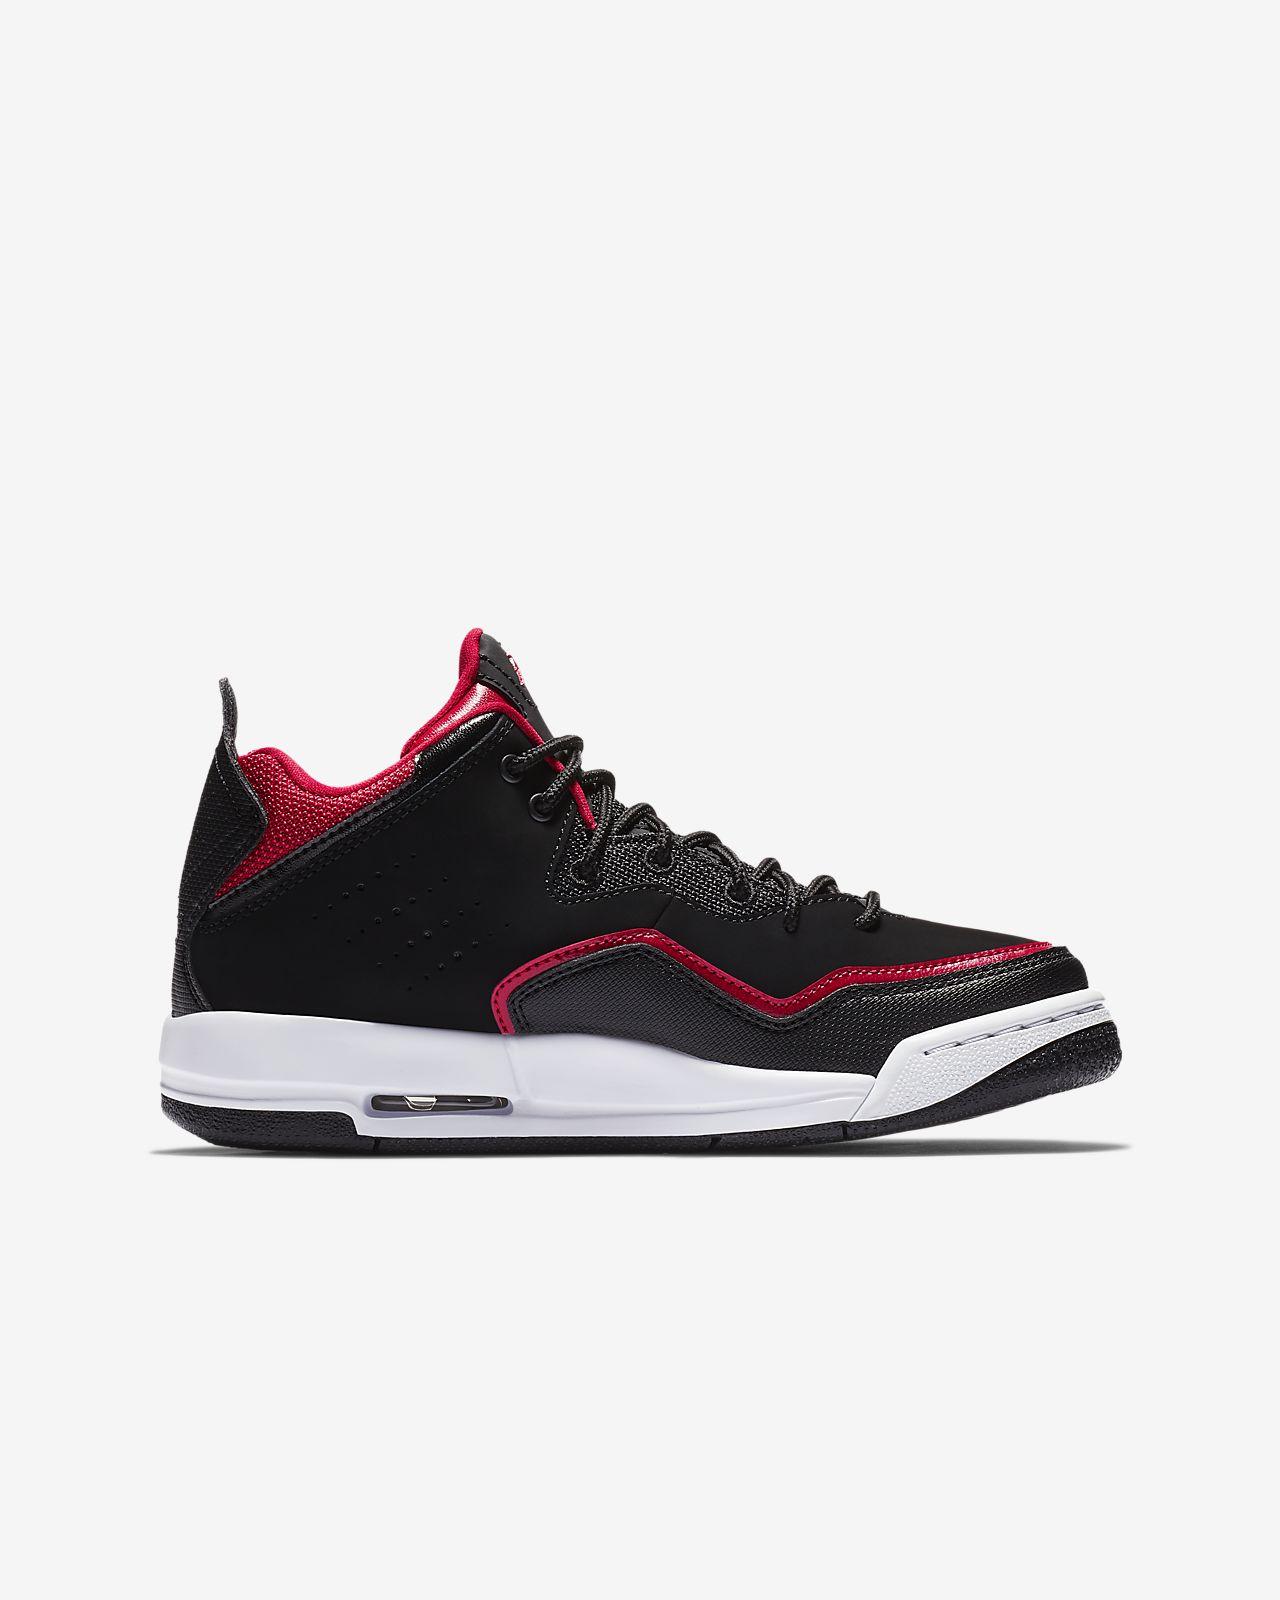 c719989aaf24 Jordan Courtside 23 Older Kids  Shoe. Nike.com CA